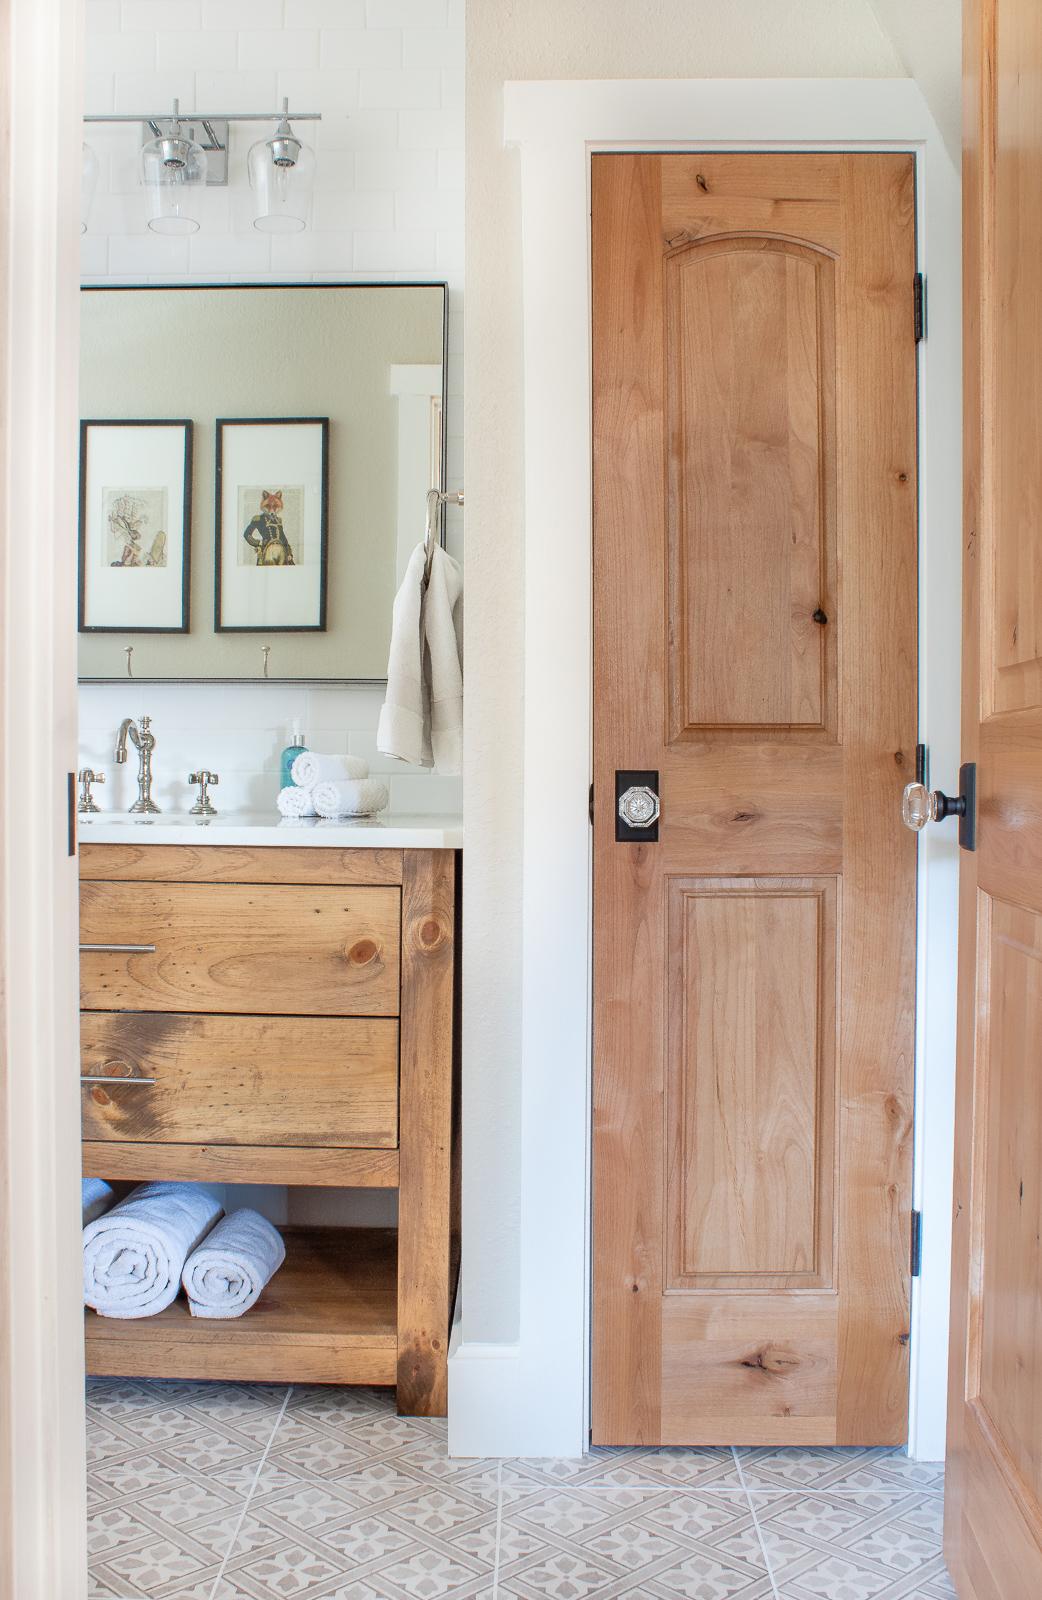 Modern cabin bathroom remodel